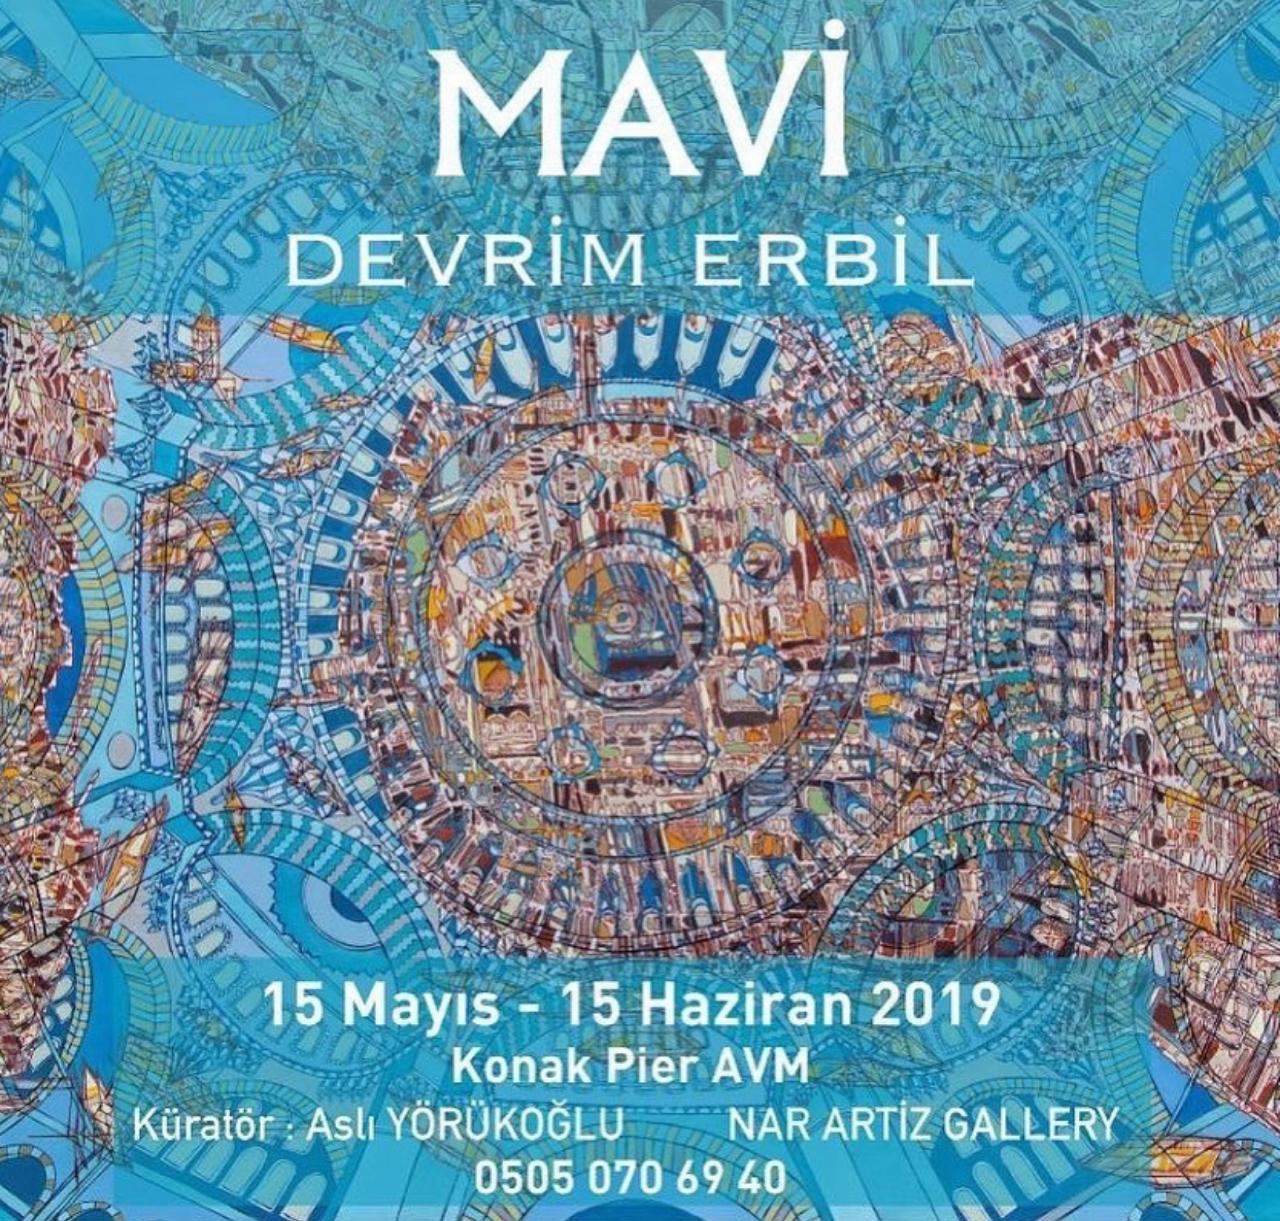 Devrim Erbil-Mavi